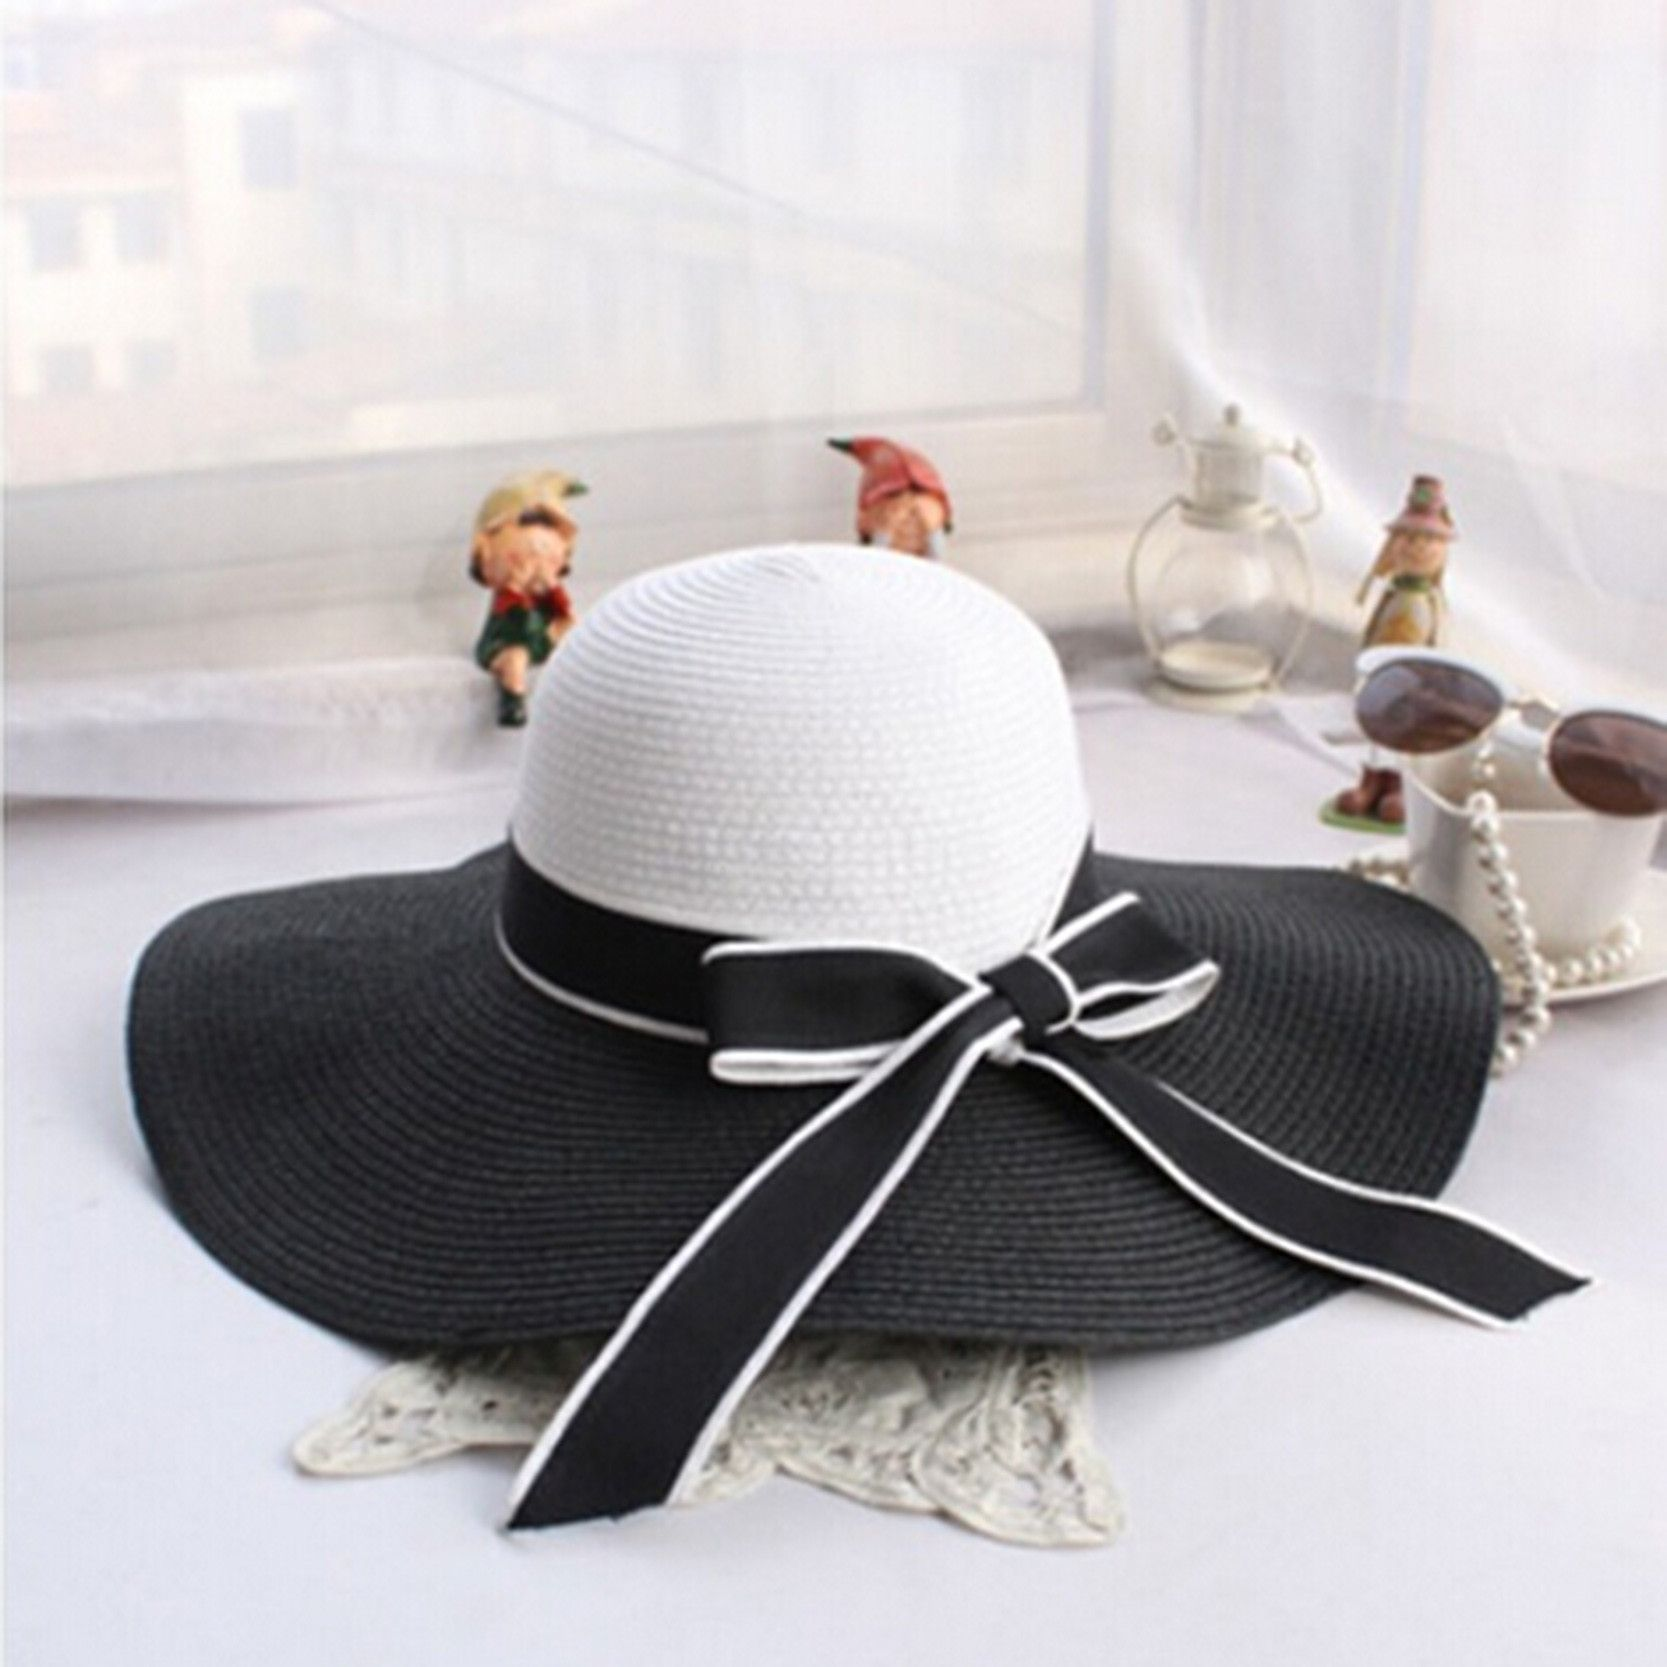 892ec3b7 Women's Classic Daisy Summer Beach Hat | Products | Pinterest ...